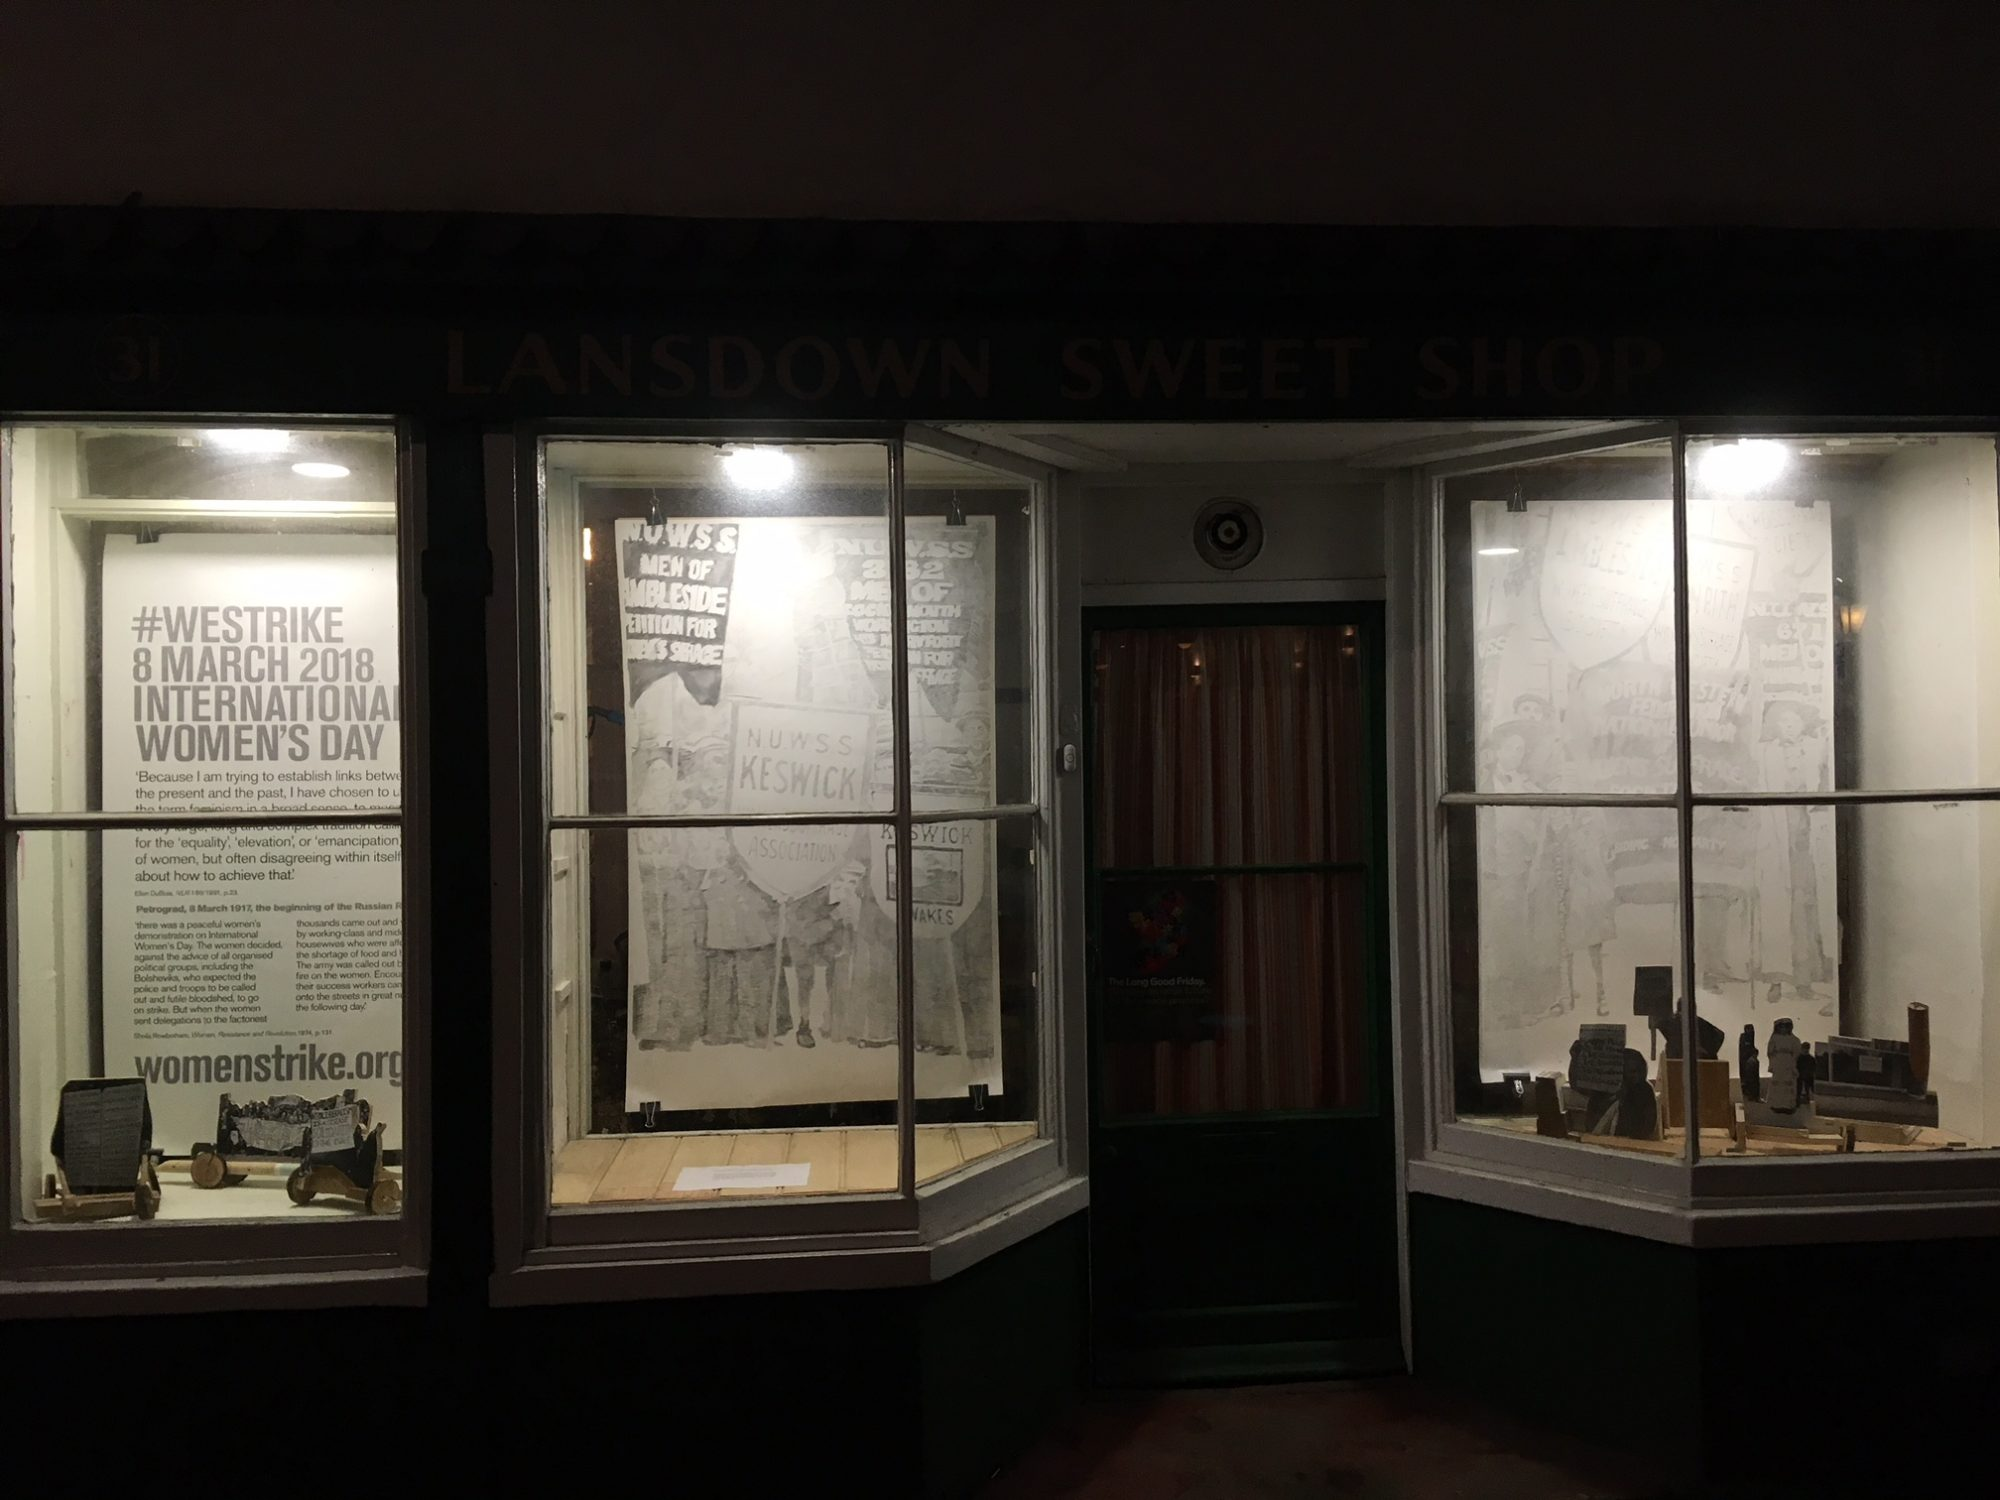 sweetshop windows at night